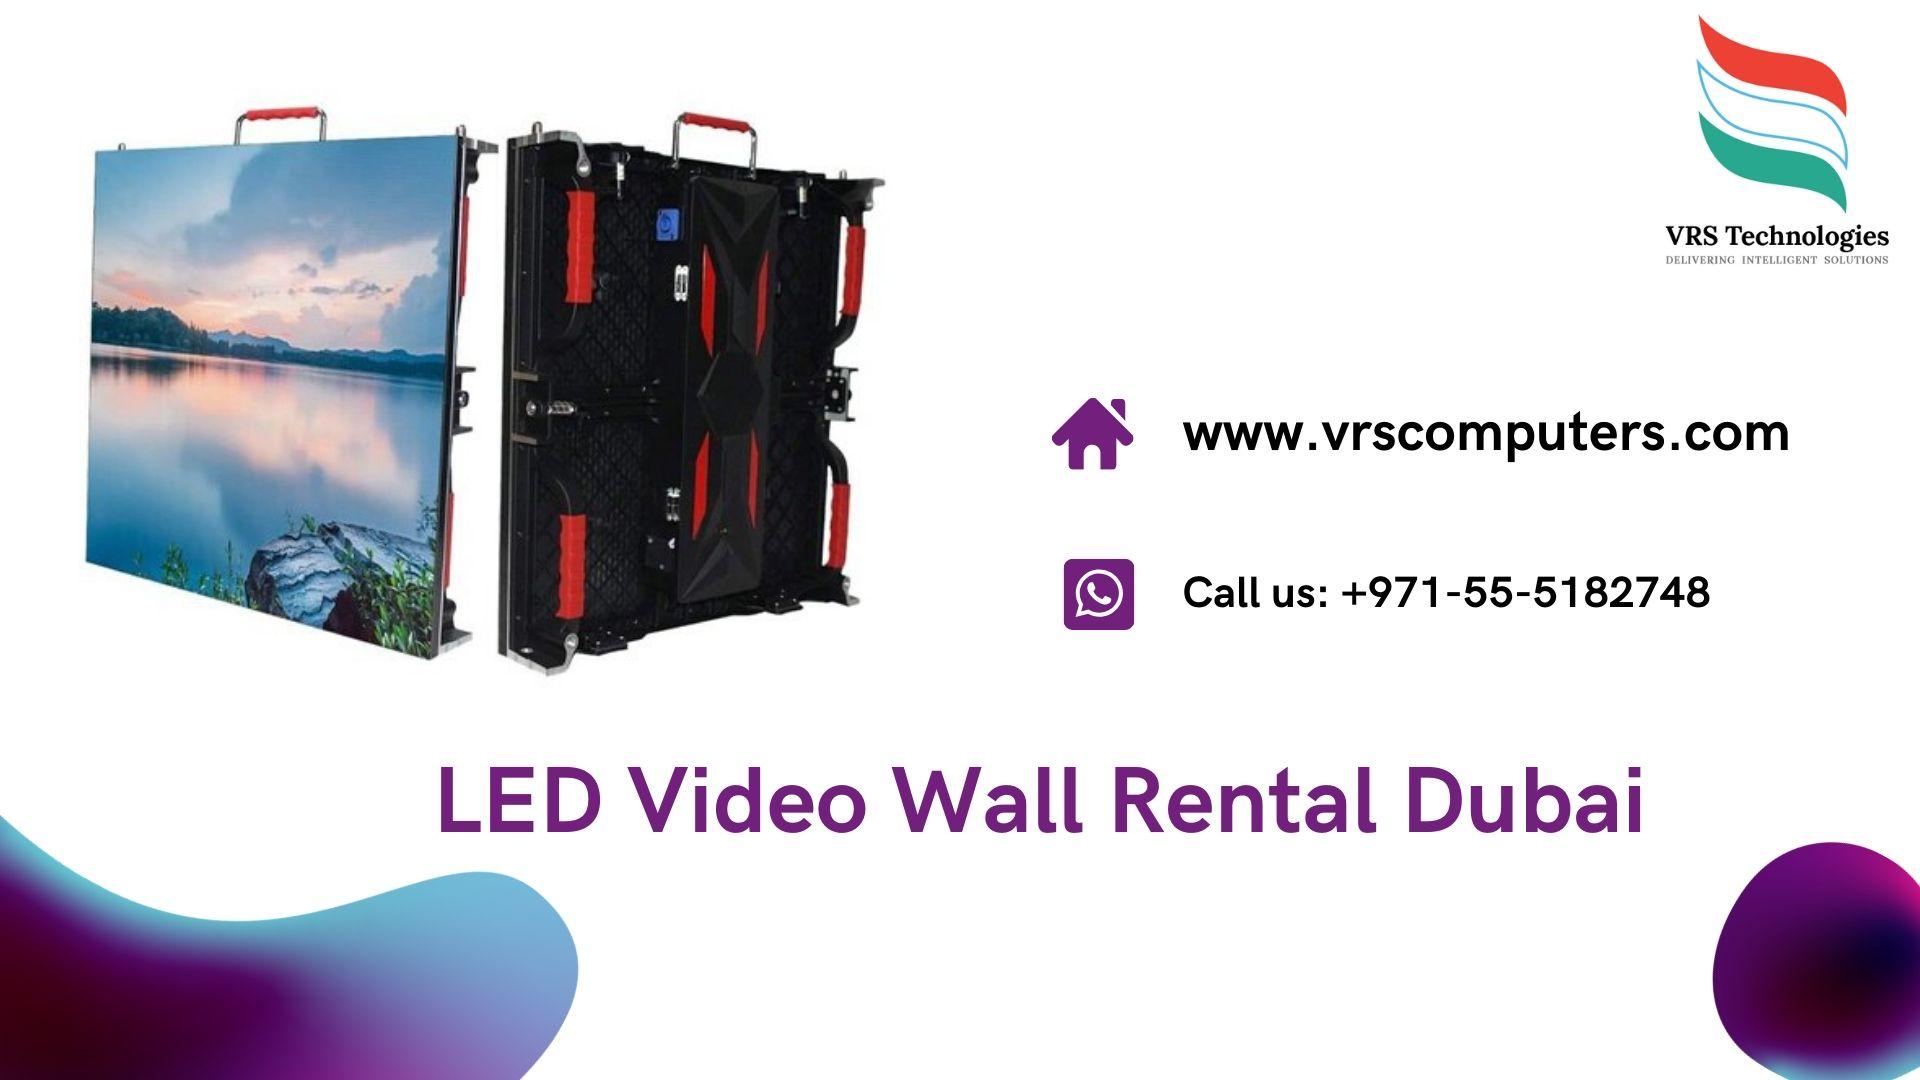 video-wall-rentals-in-dubai-uae